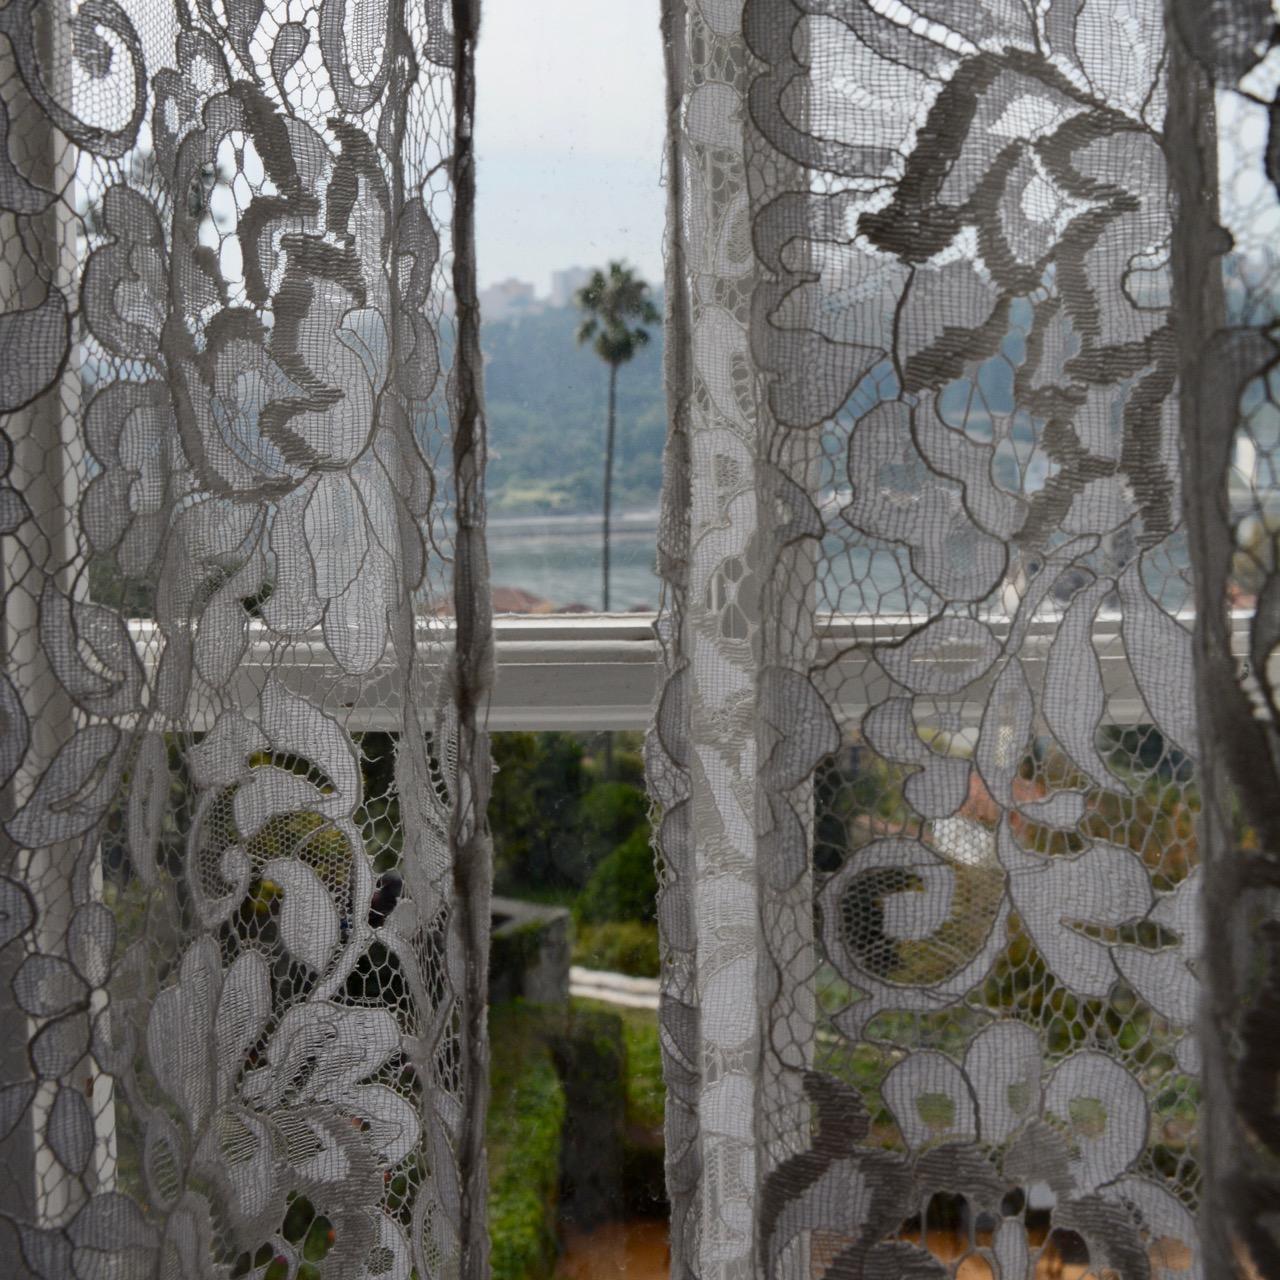 travel with kids children porto portugal romantic museum garden